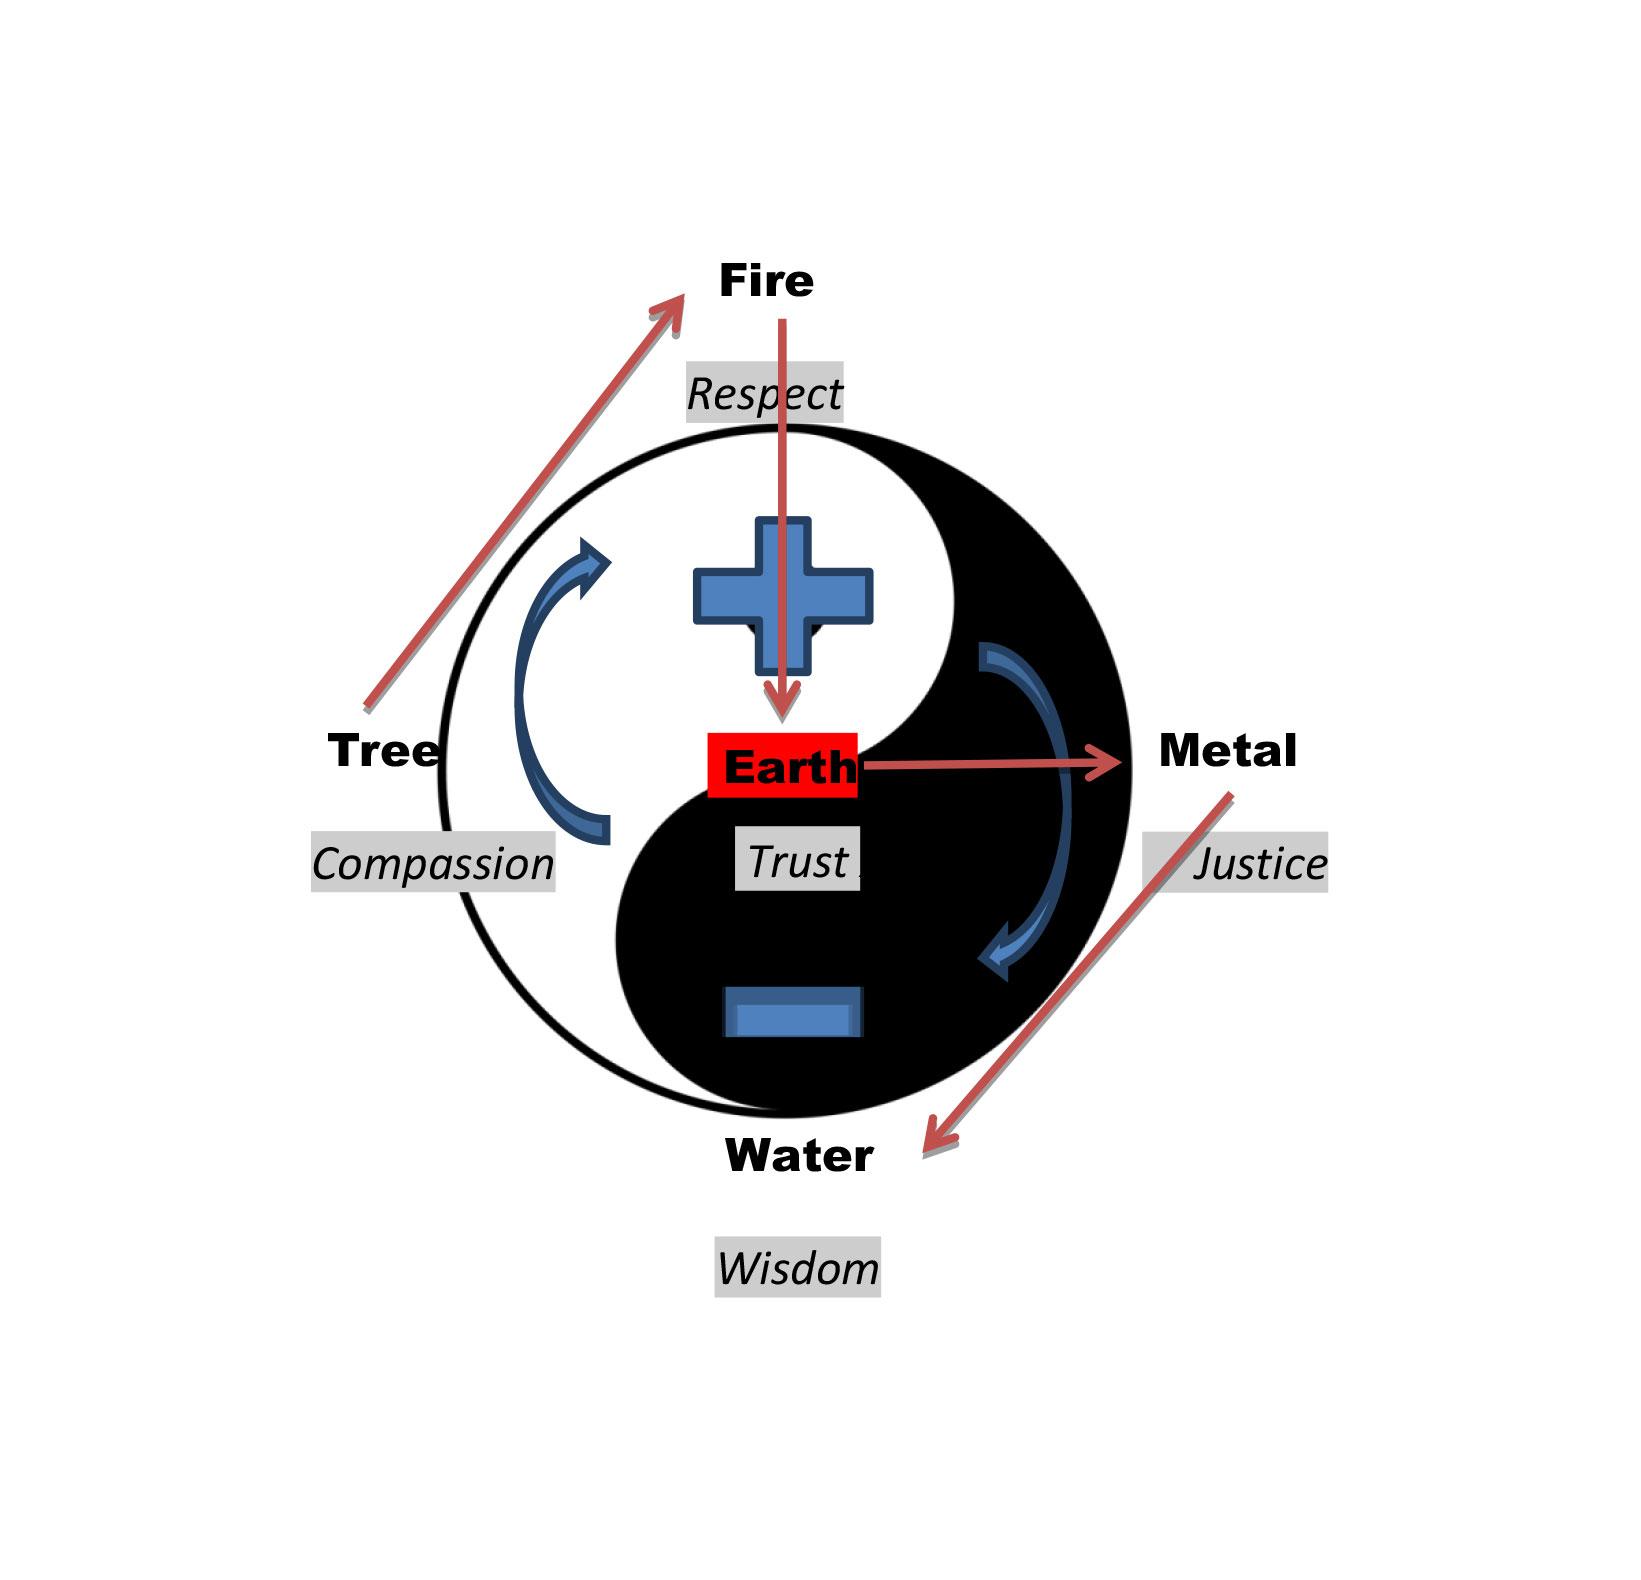 martial arts diagram pea flower hong ik of bronxville taegeuk and